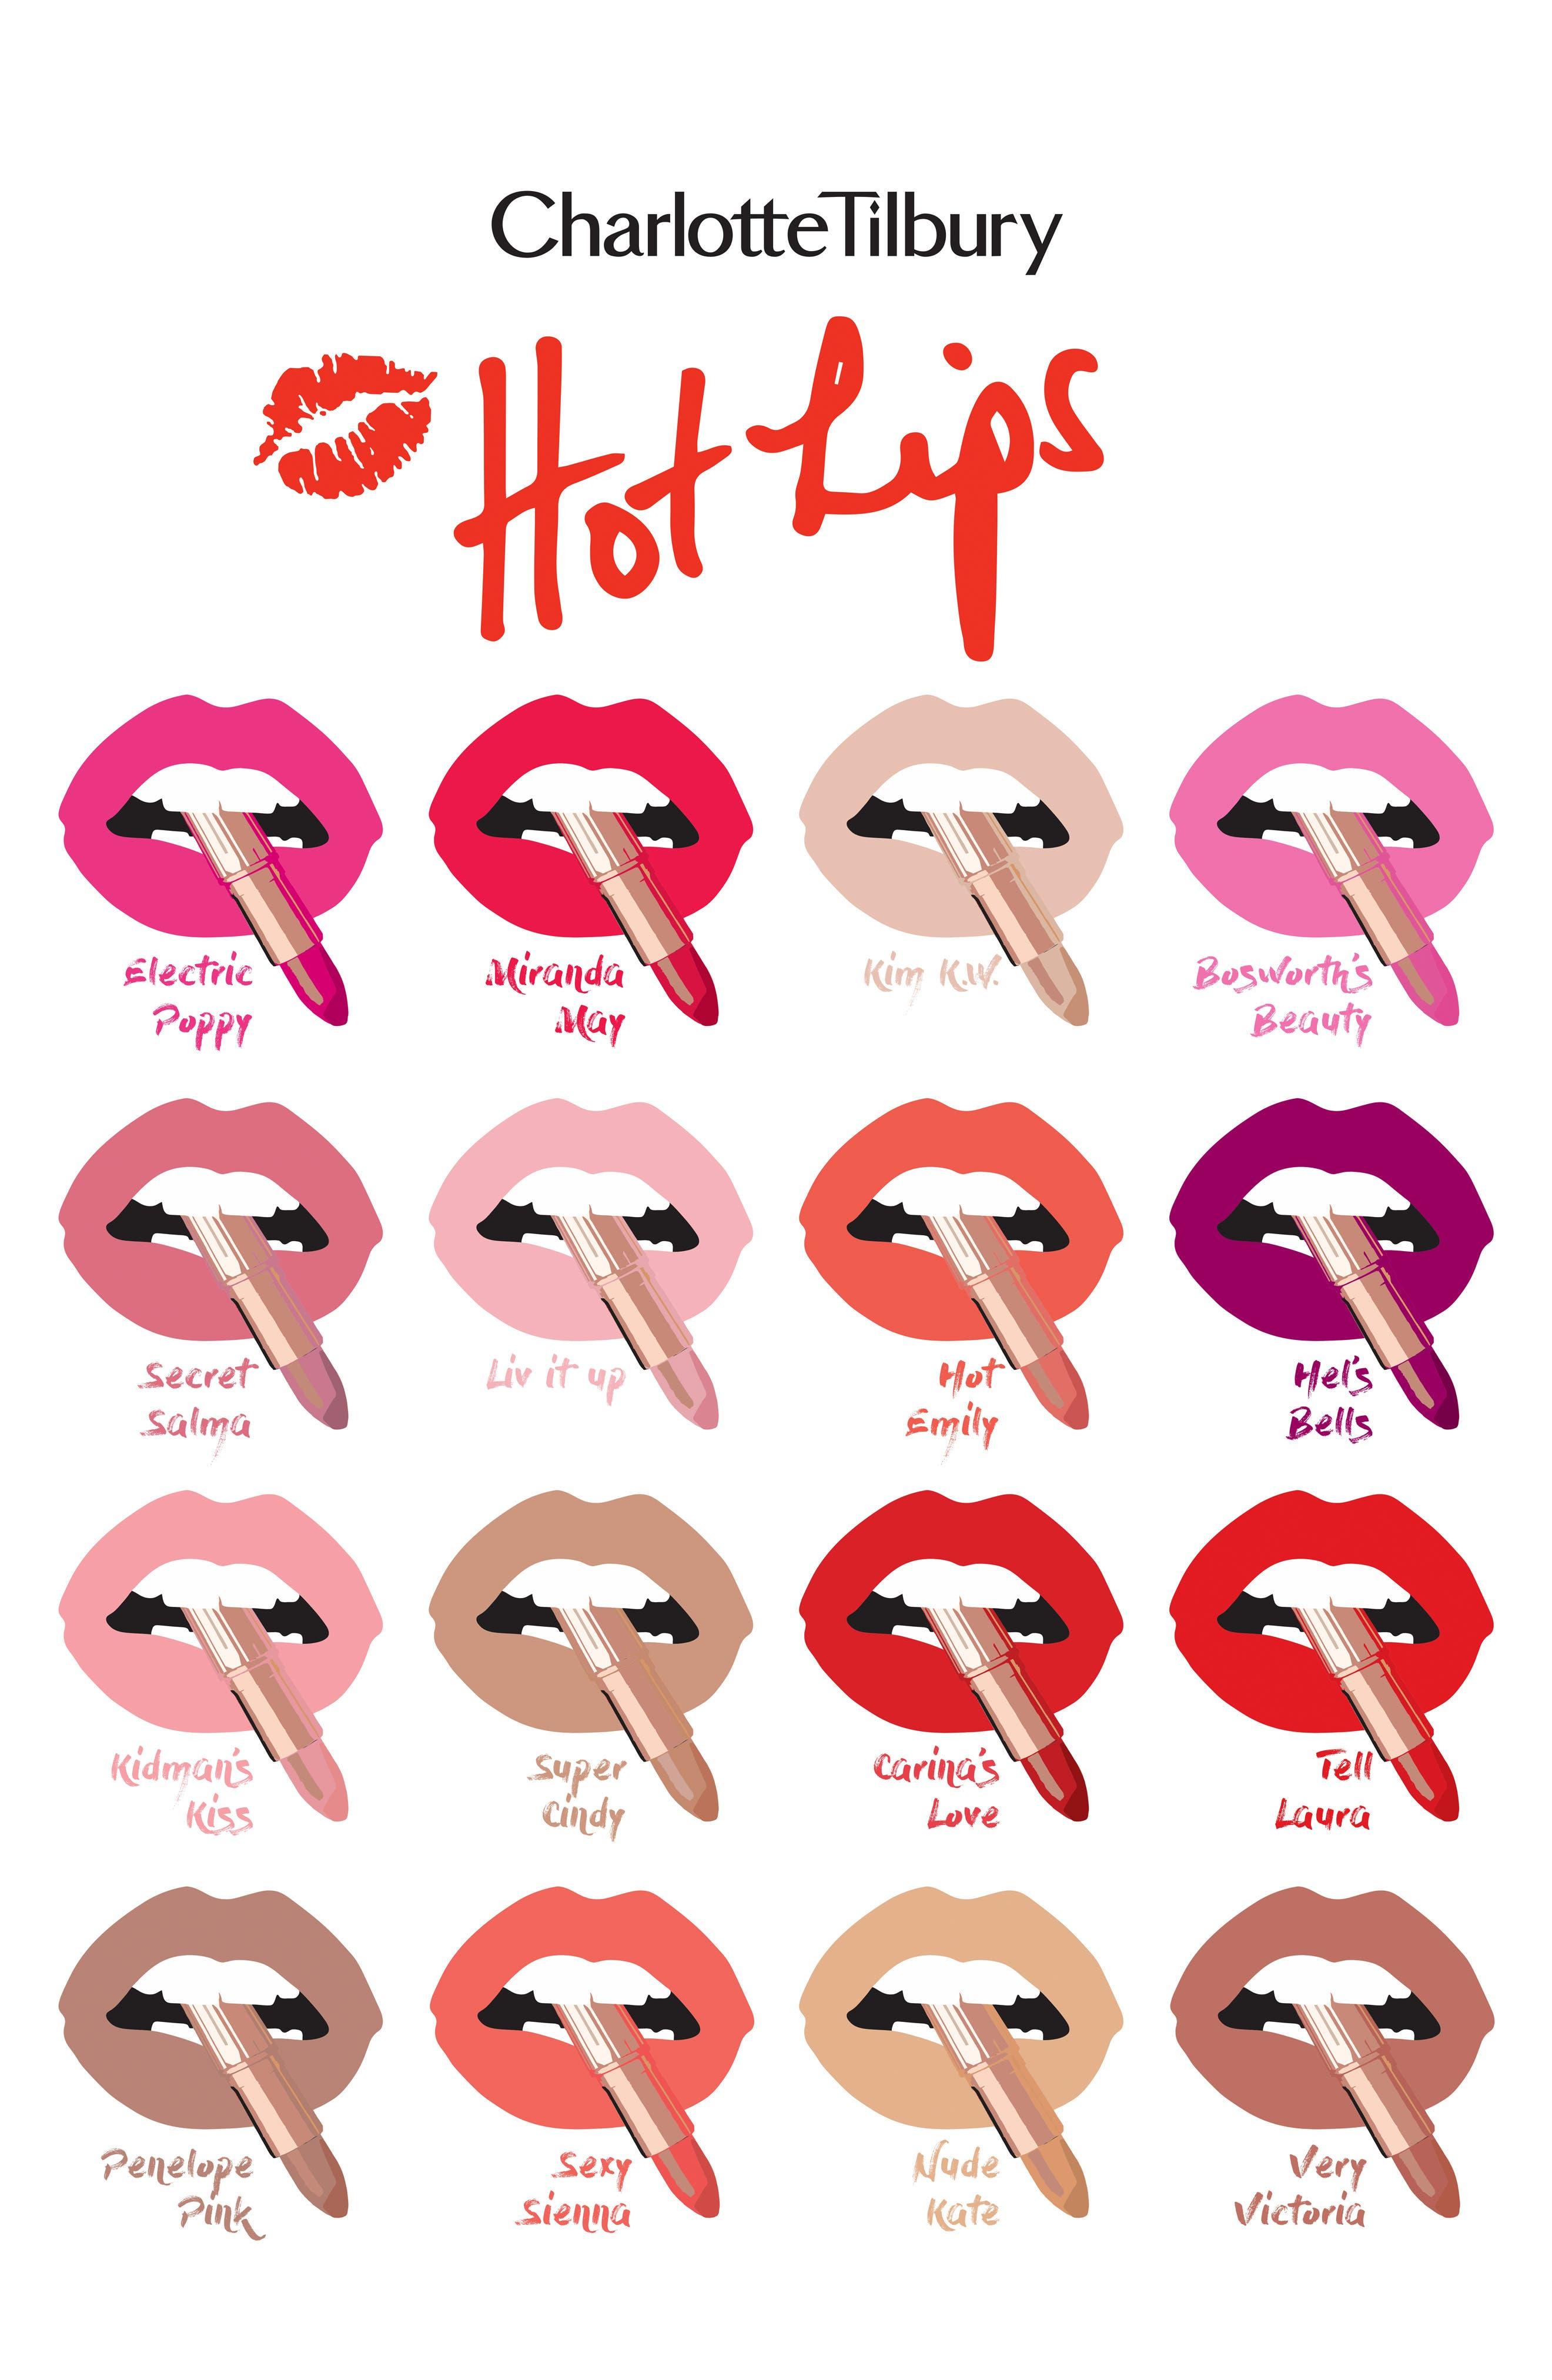 CHARLOTTE TILBURY, Hot Lips Lipstick, Alternate thumbnail 2, color, BOSWORTH'S BEAUTY